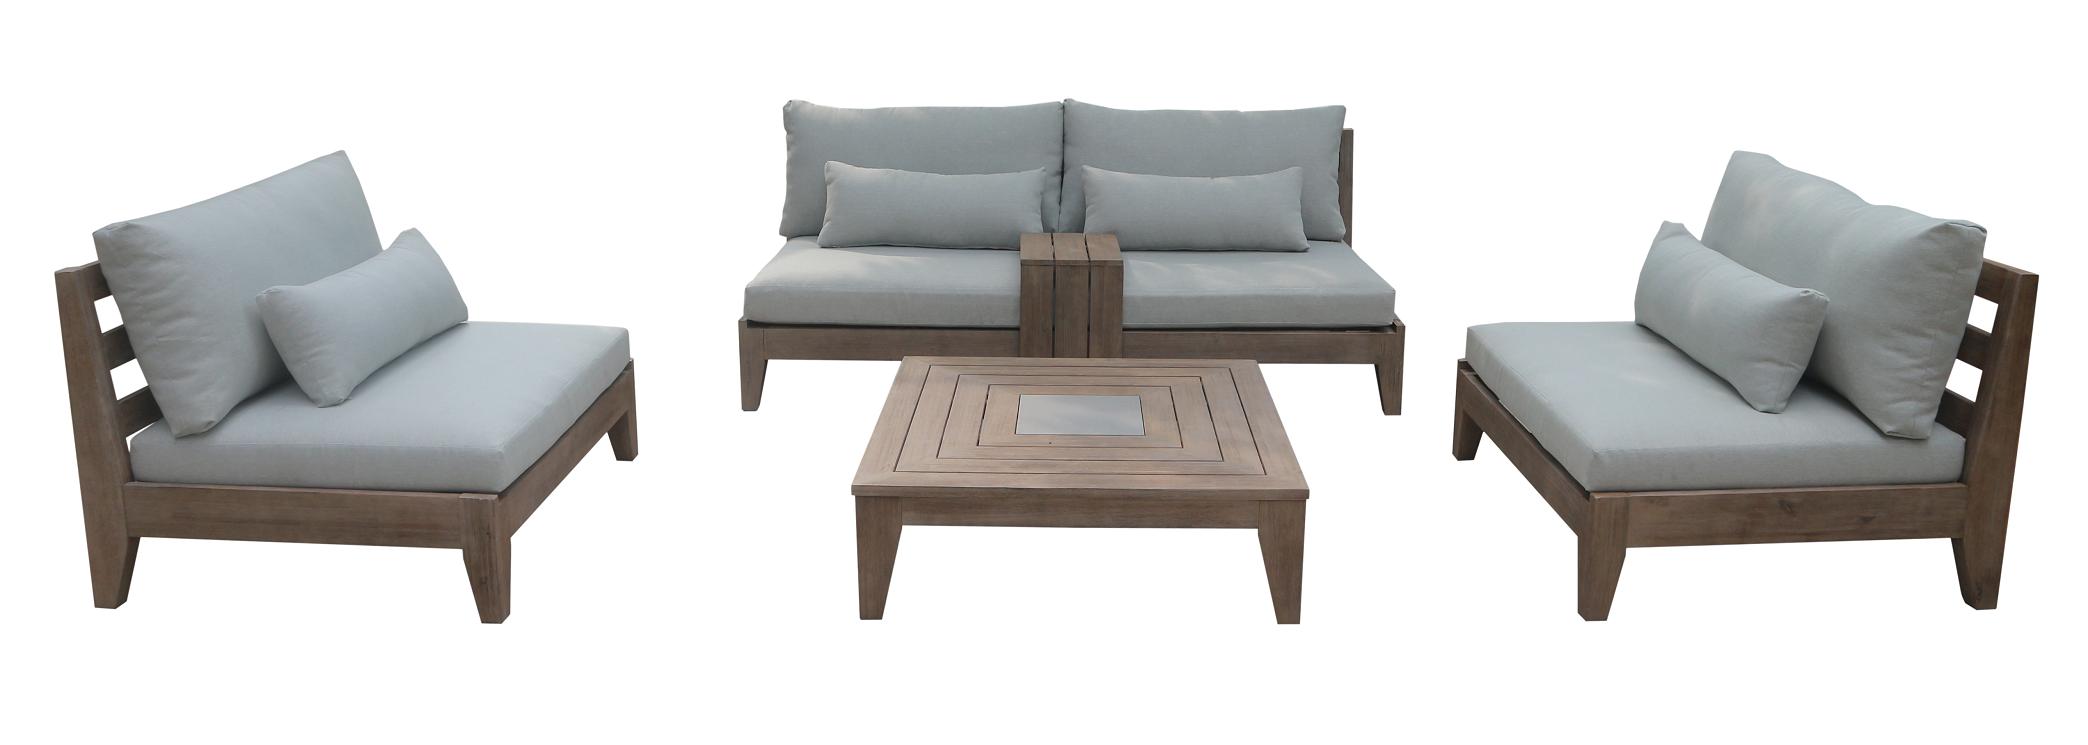 Oxford 5 Seat Chunky Timber Lounge